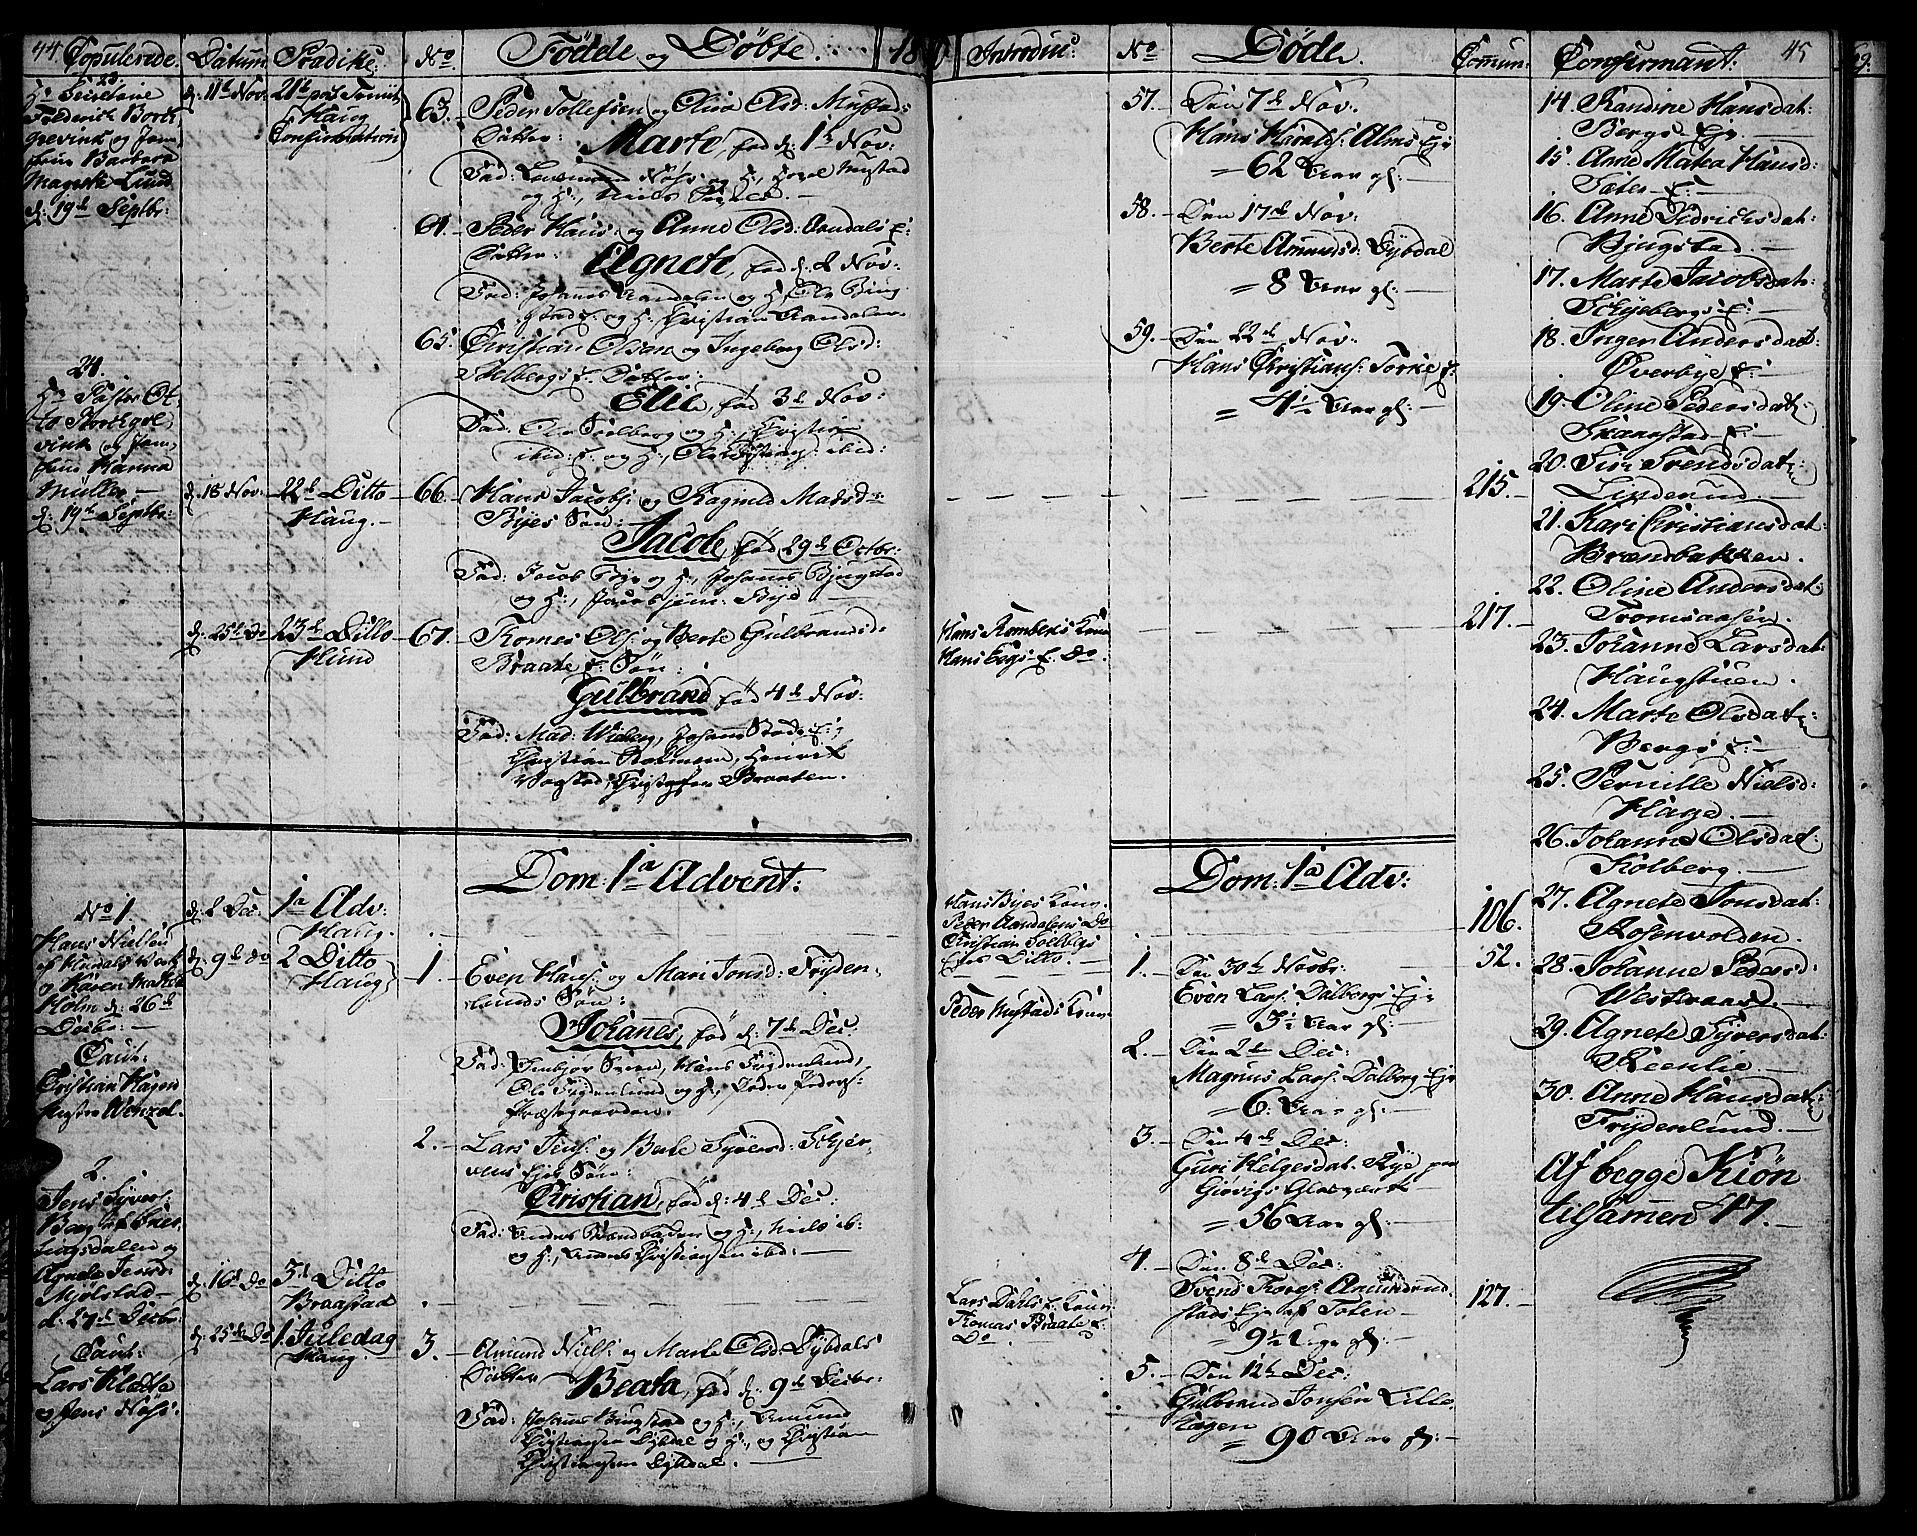 SAH, Vardal prestekontor, H/Ha/Haa/L0003: Ministerialbok nr. 3, 1808-1814, s. 44-45